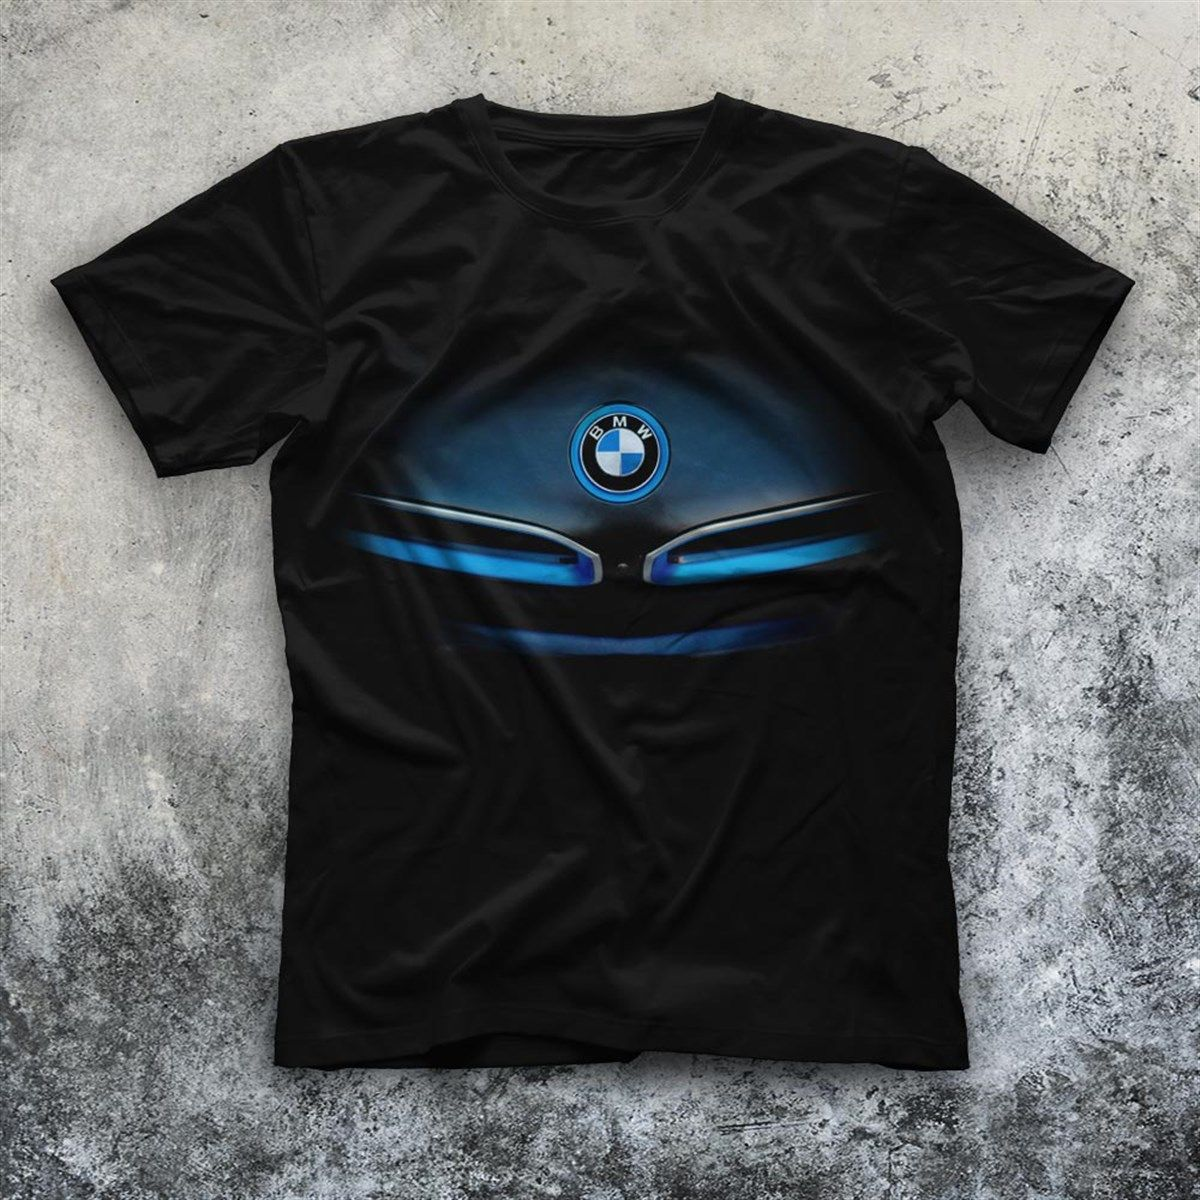 Bmw Black Unisex T Shirt Bmw Black Mens Outfits T Shirt